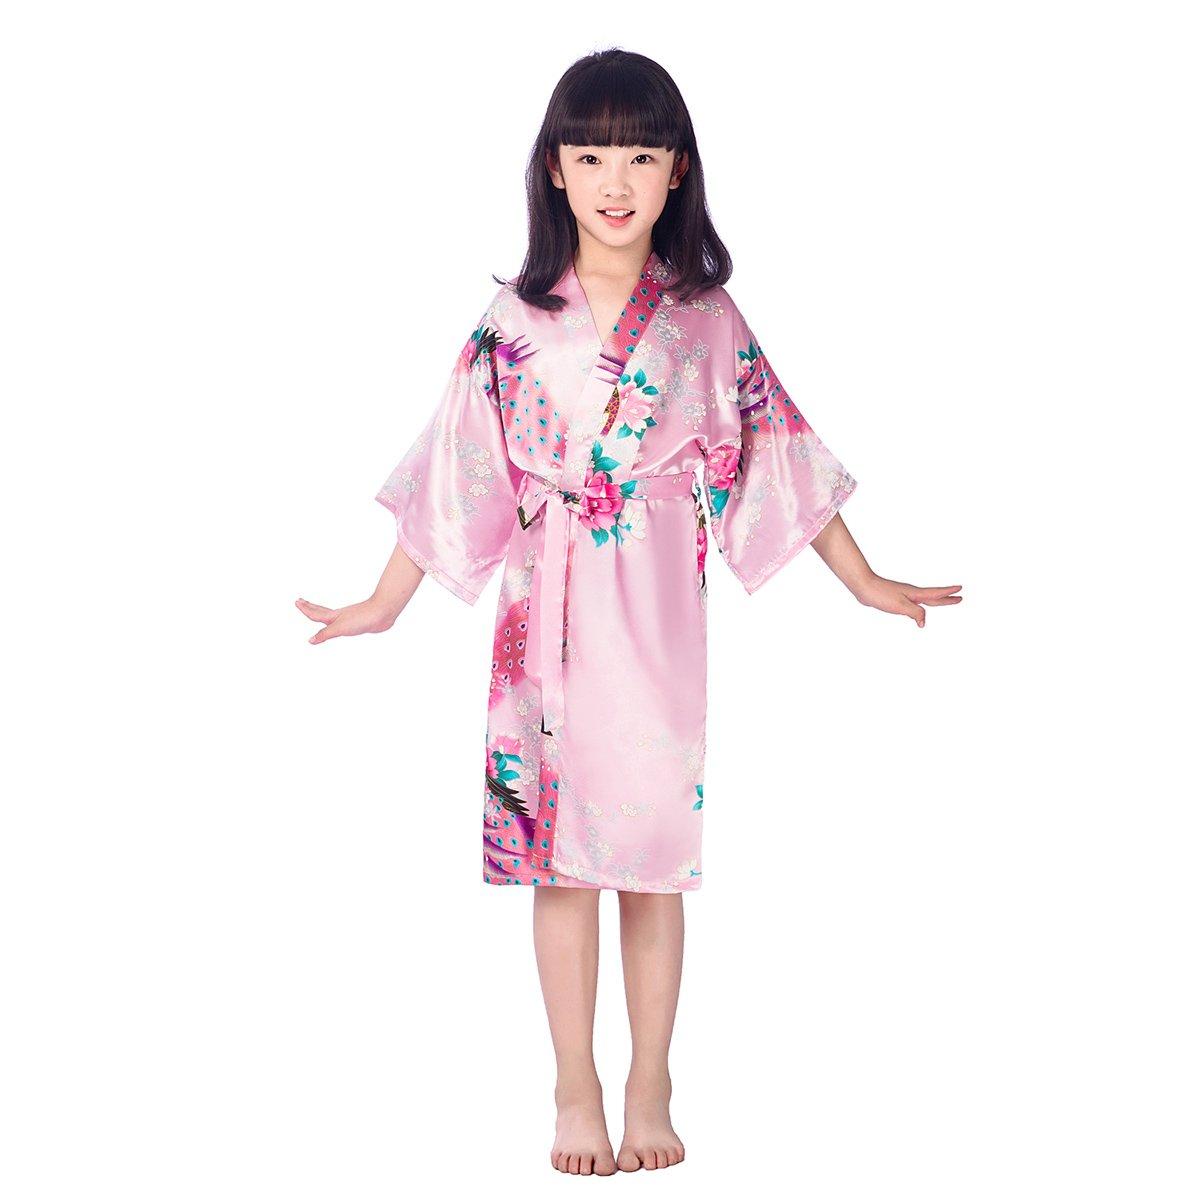 Tinksky Kids Satin Kimono Robe Girls' Silk Sleepwear Nightgown Peacock Bathrobe for Spa Party Wedding Birthday Size 10(Pink) A20M145933MV80S5199